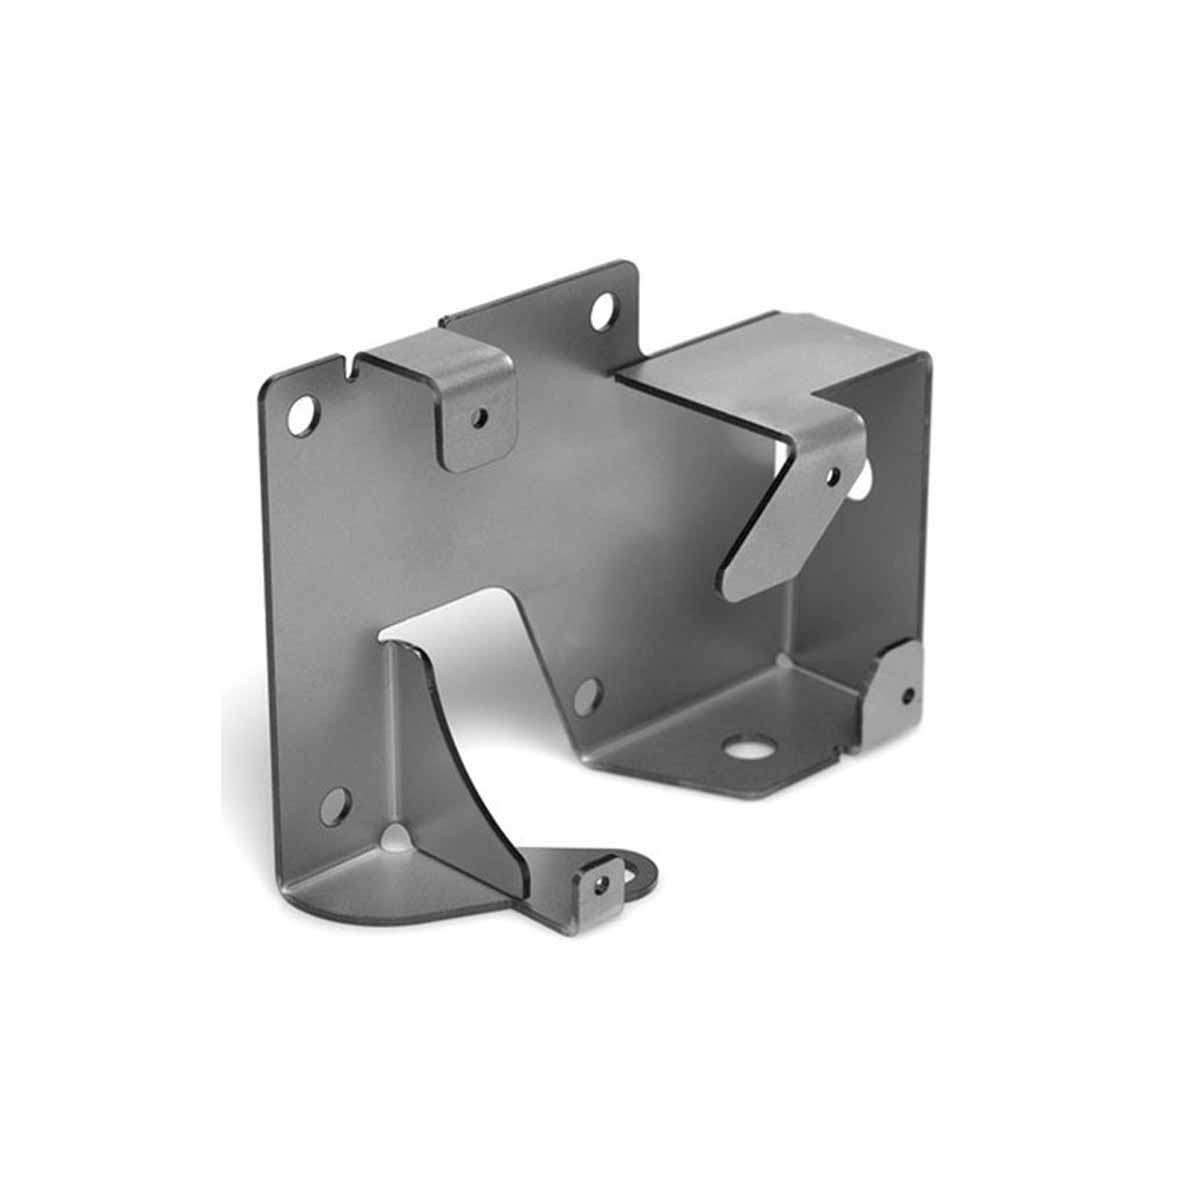 CNC Press Brake Bending